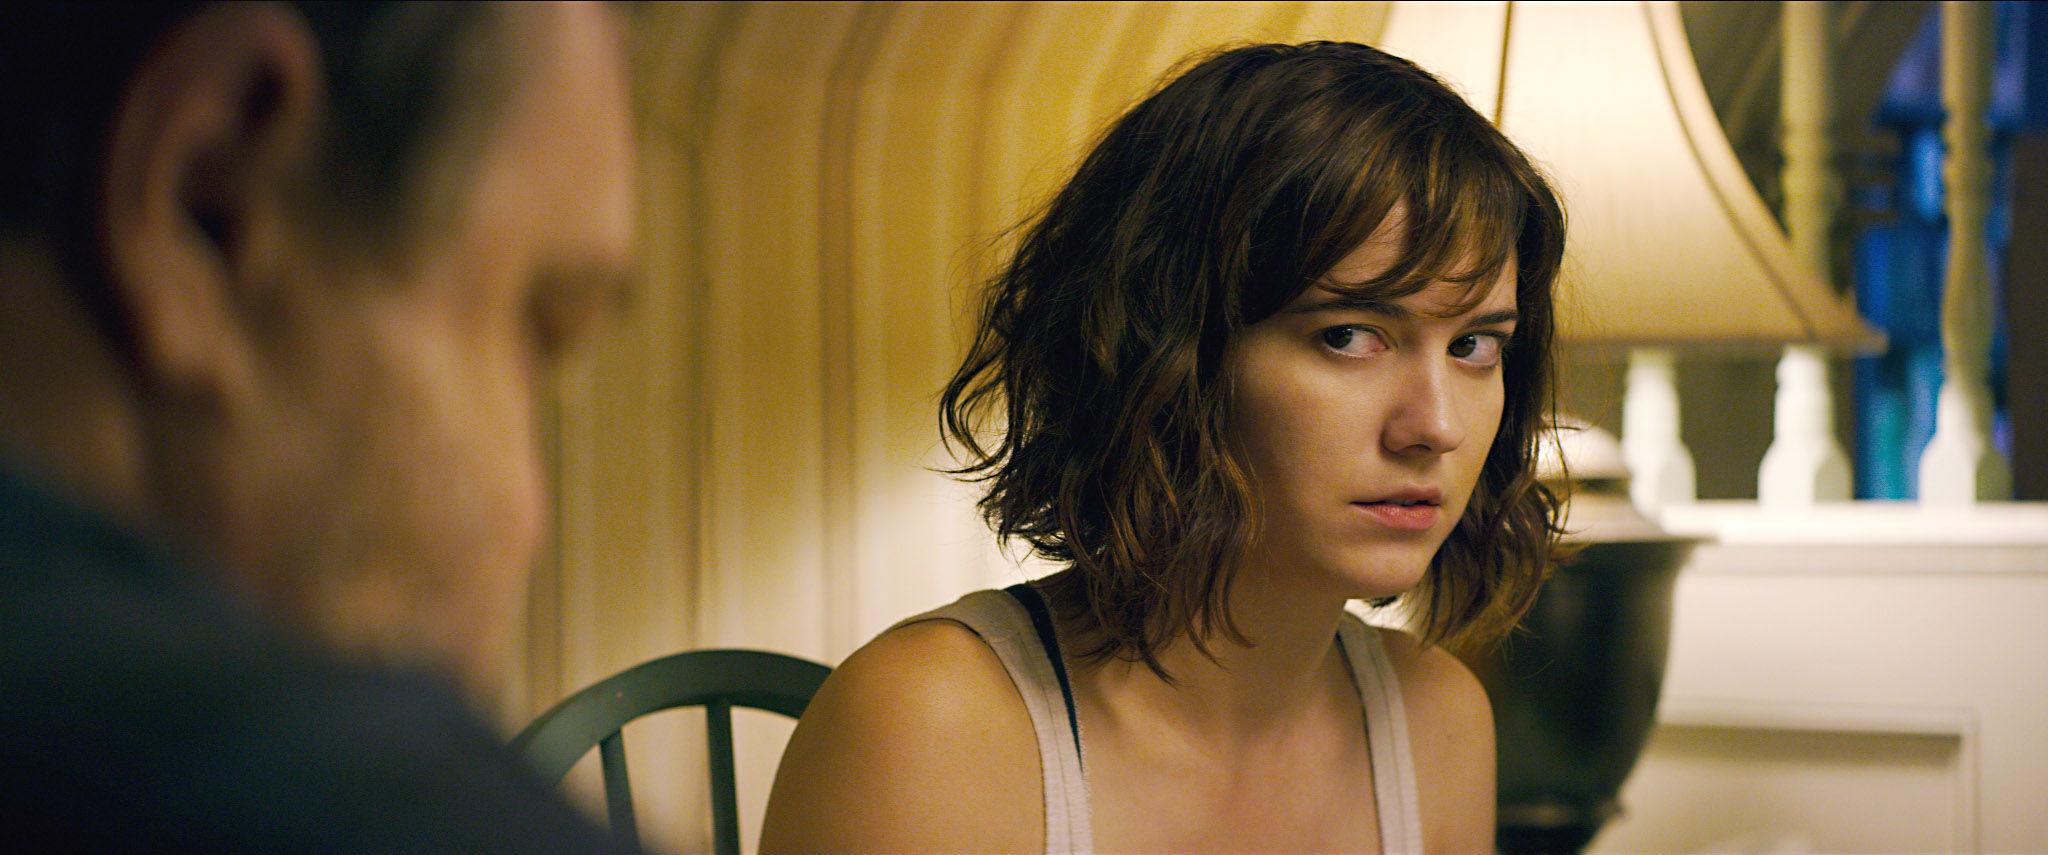 movie news mary elizabeth winstead to star in dark comedy